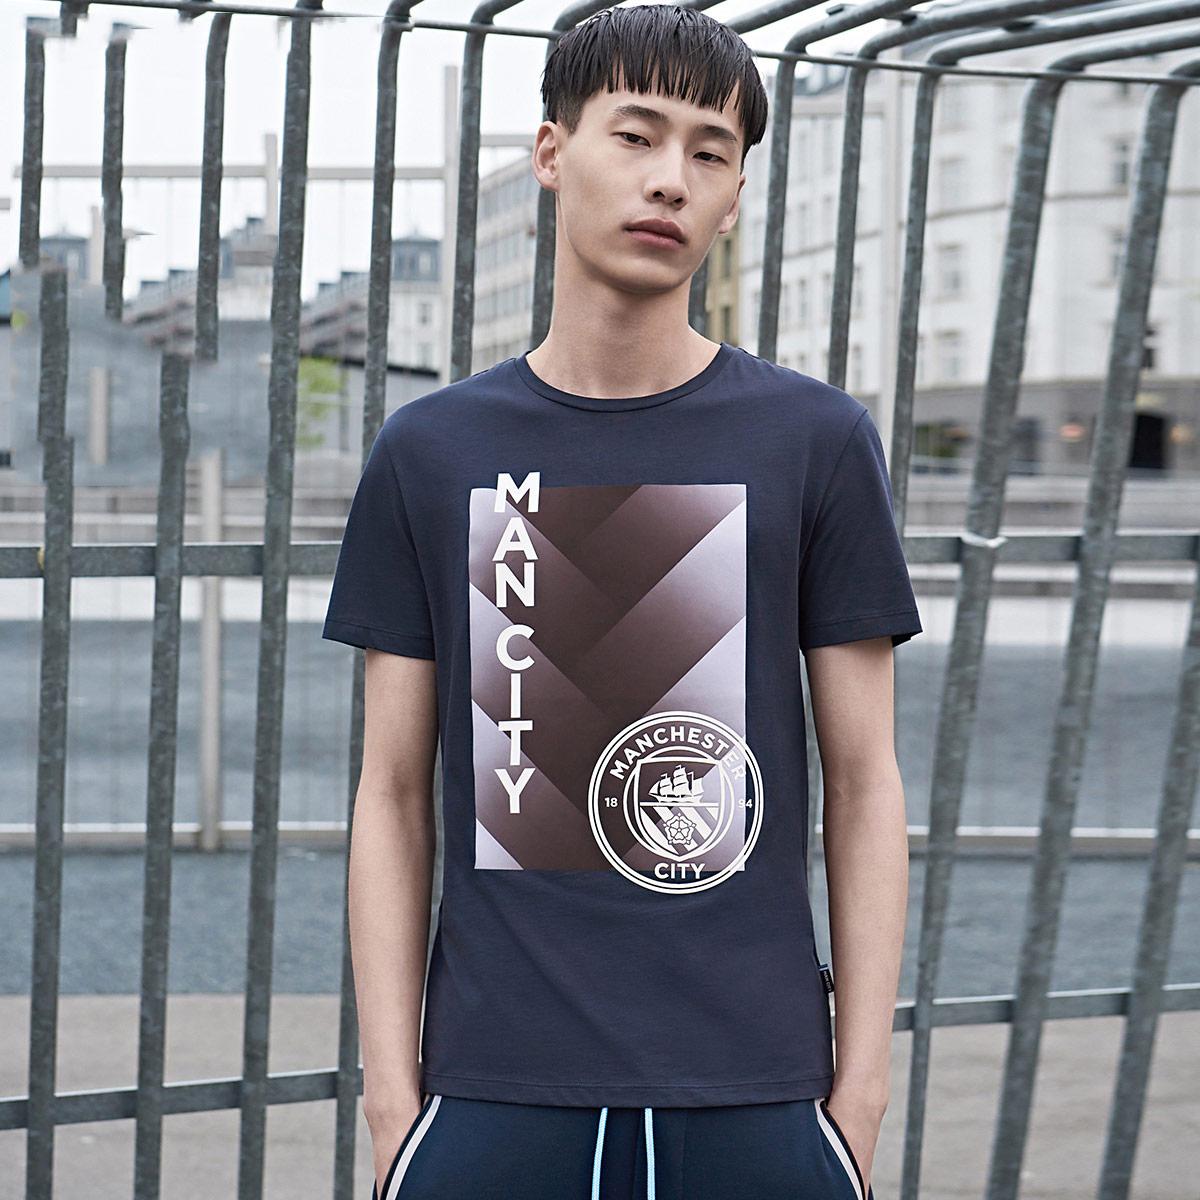 JackJones杰克琼斯足球俱乐部男短袖T恤C 217301542